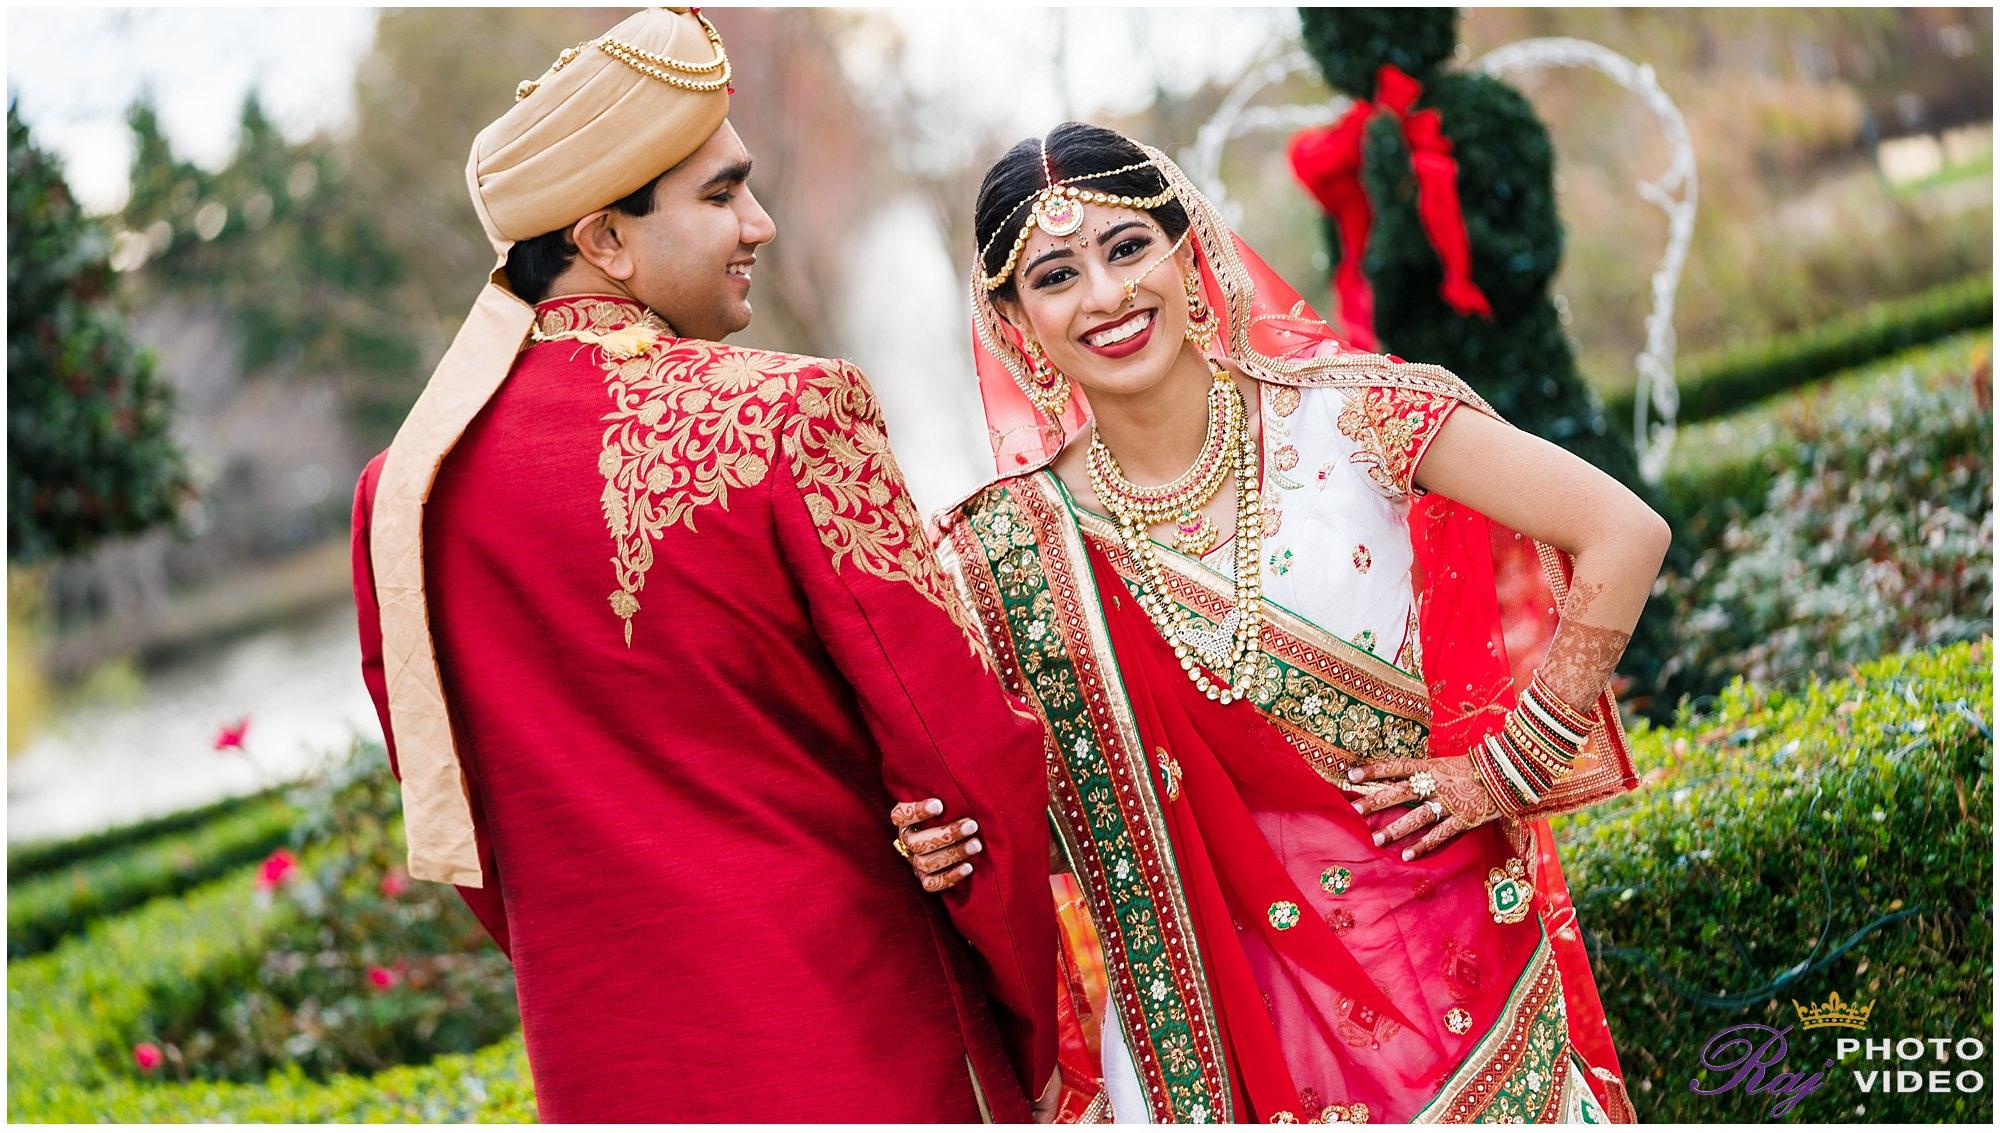 Founders-Inn-and-Spa-Virginia-Beach-VA-Indian-Wedding-Harini-Vivek-61.jpg